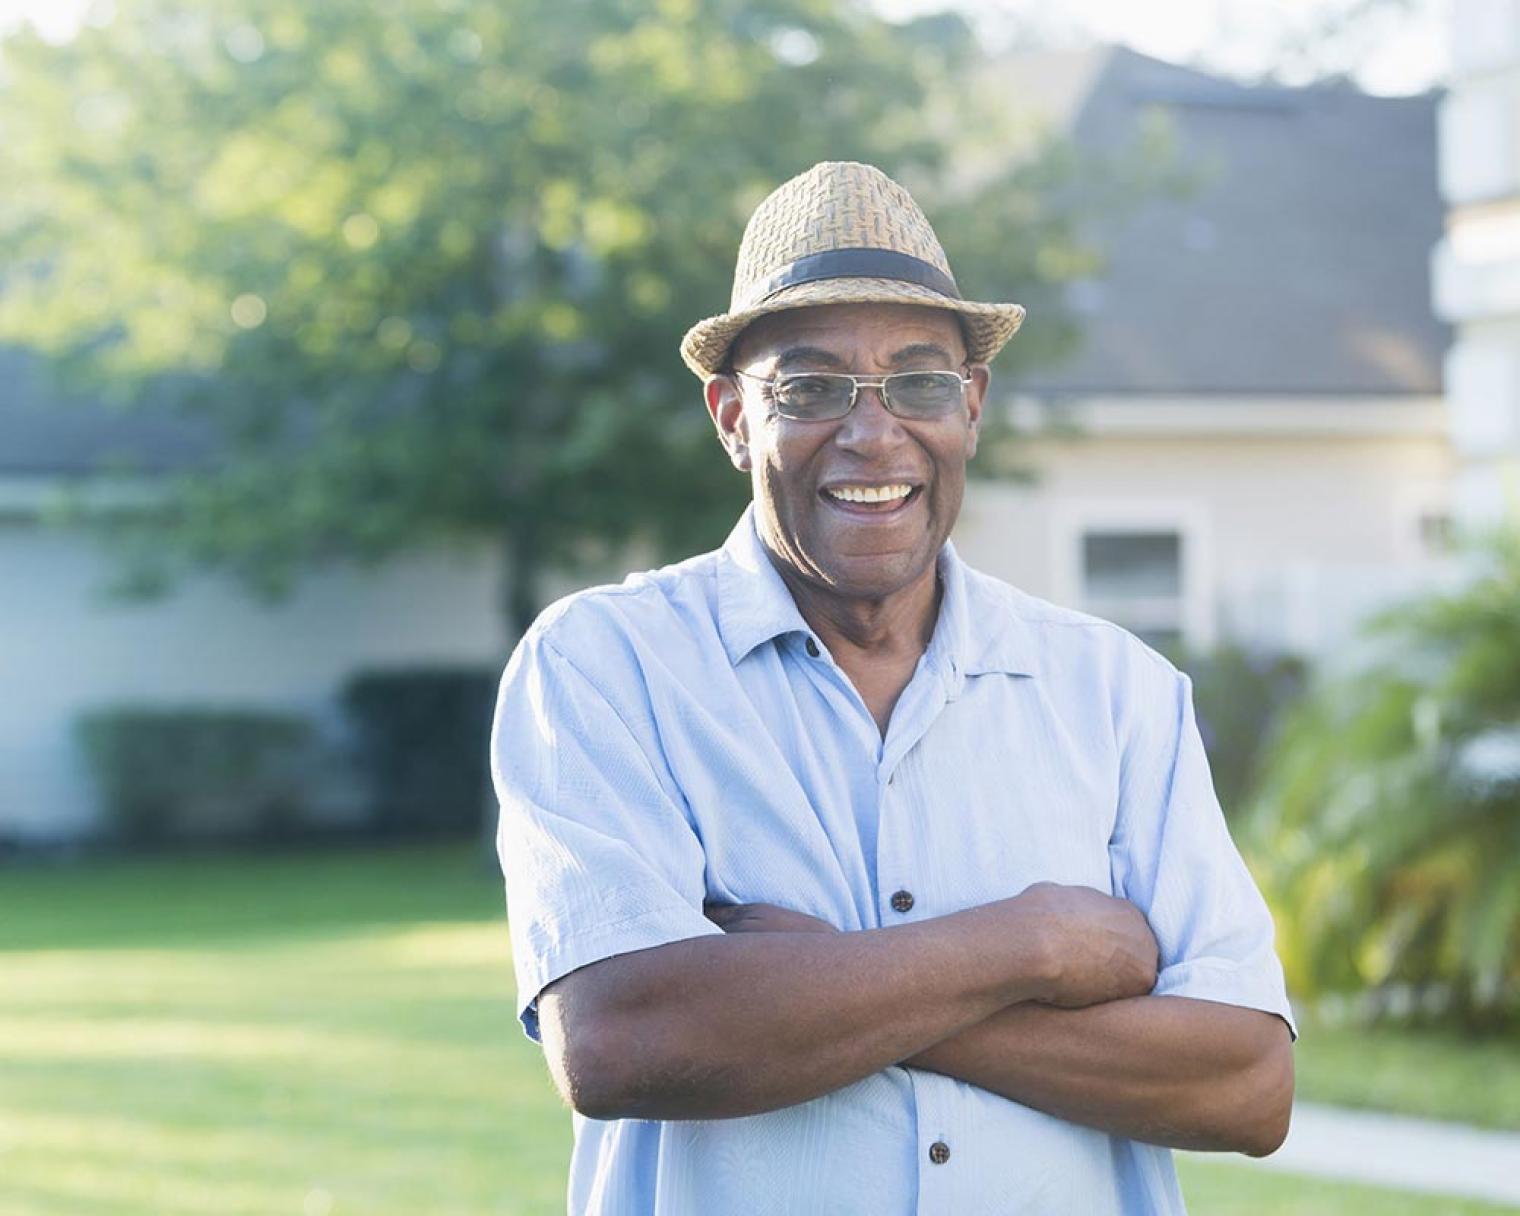 Smiling man standing in a garden